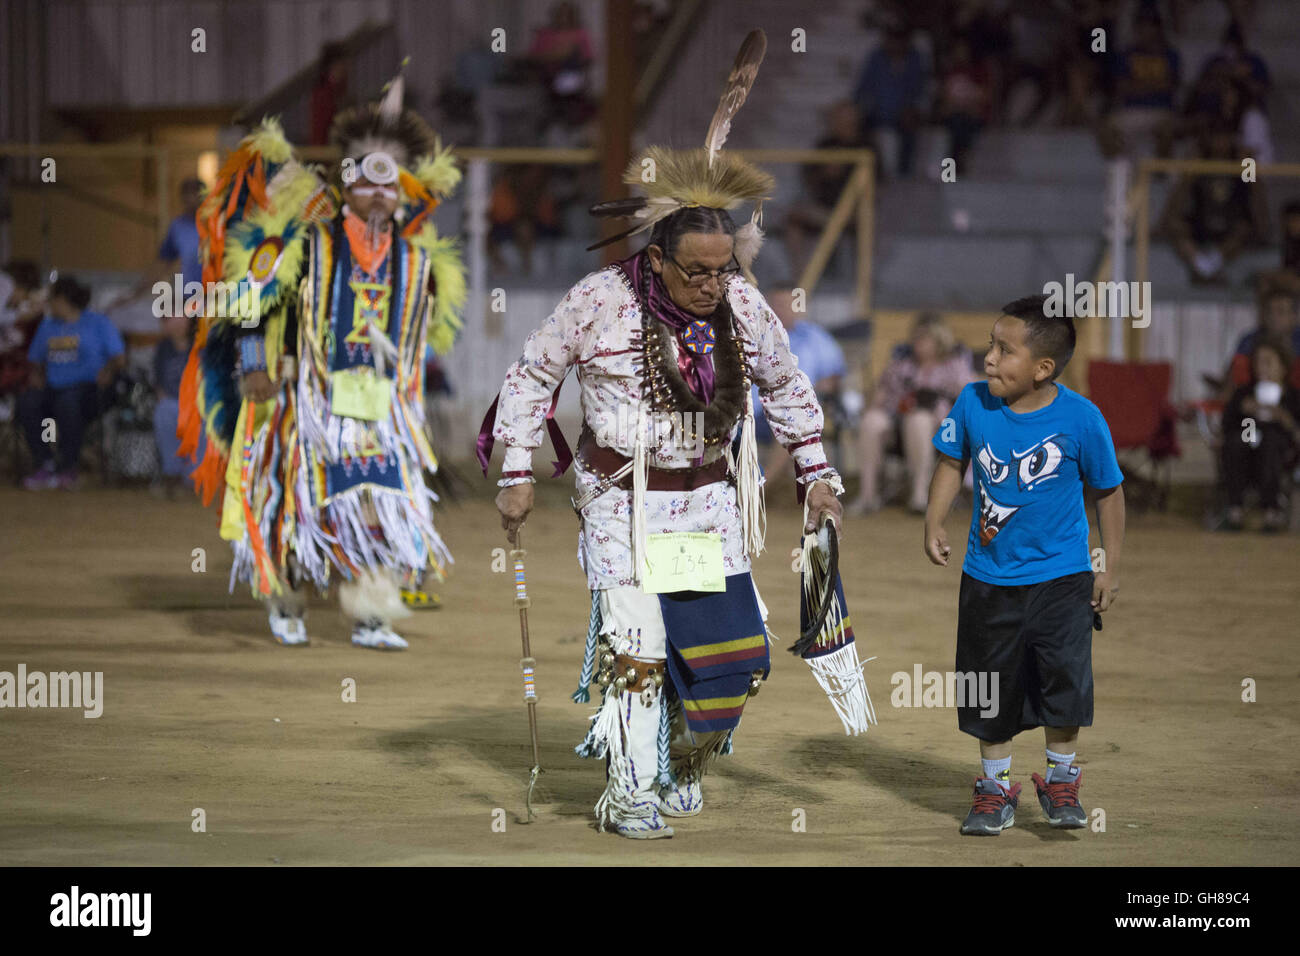 Anadarko, Oklahoma, USA. 8th Nov, 2016. during the annual American Indian Expo in Anadarko, Oklahoma.The annual - Stock Image